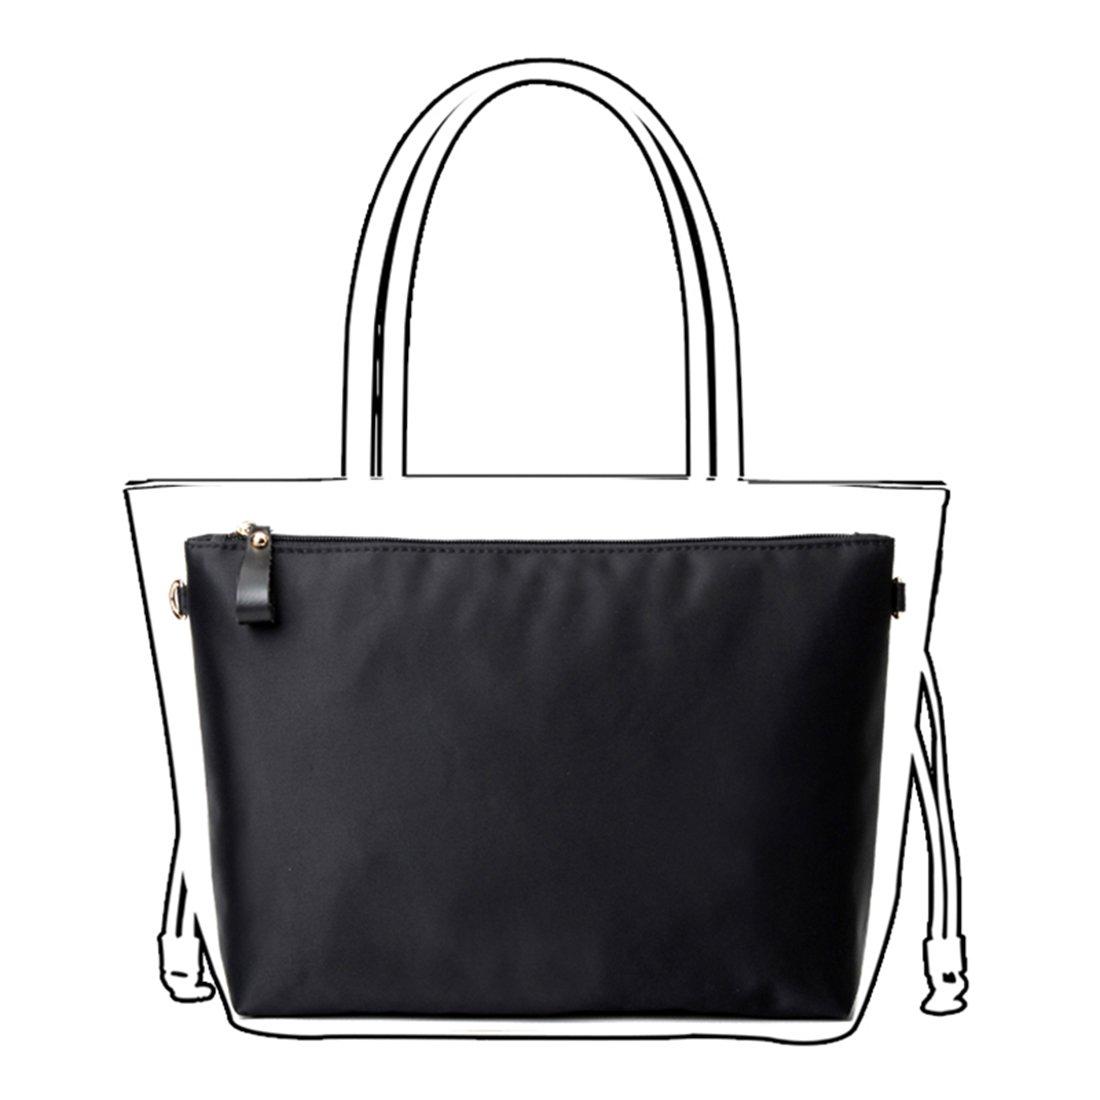 Enerhu Nylon Insert Bags Handbag Tote Purse Organizer Bag in Bag Backpack Travel Storage Pockets Zipper Clouse Medium #2 Black